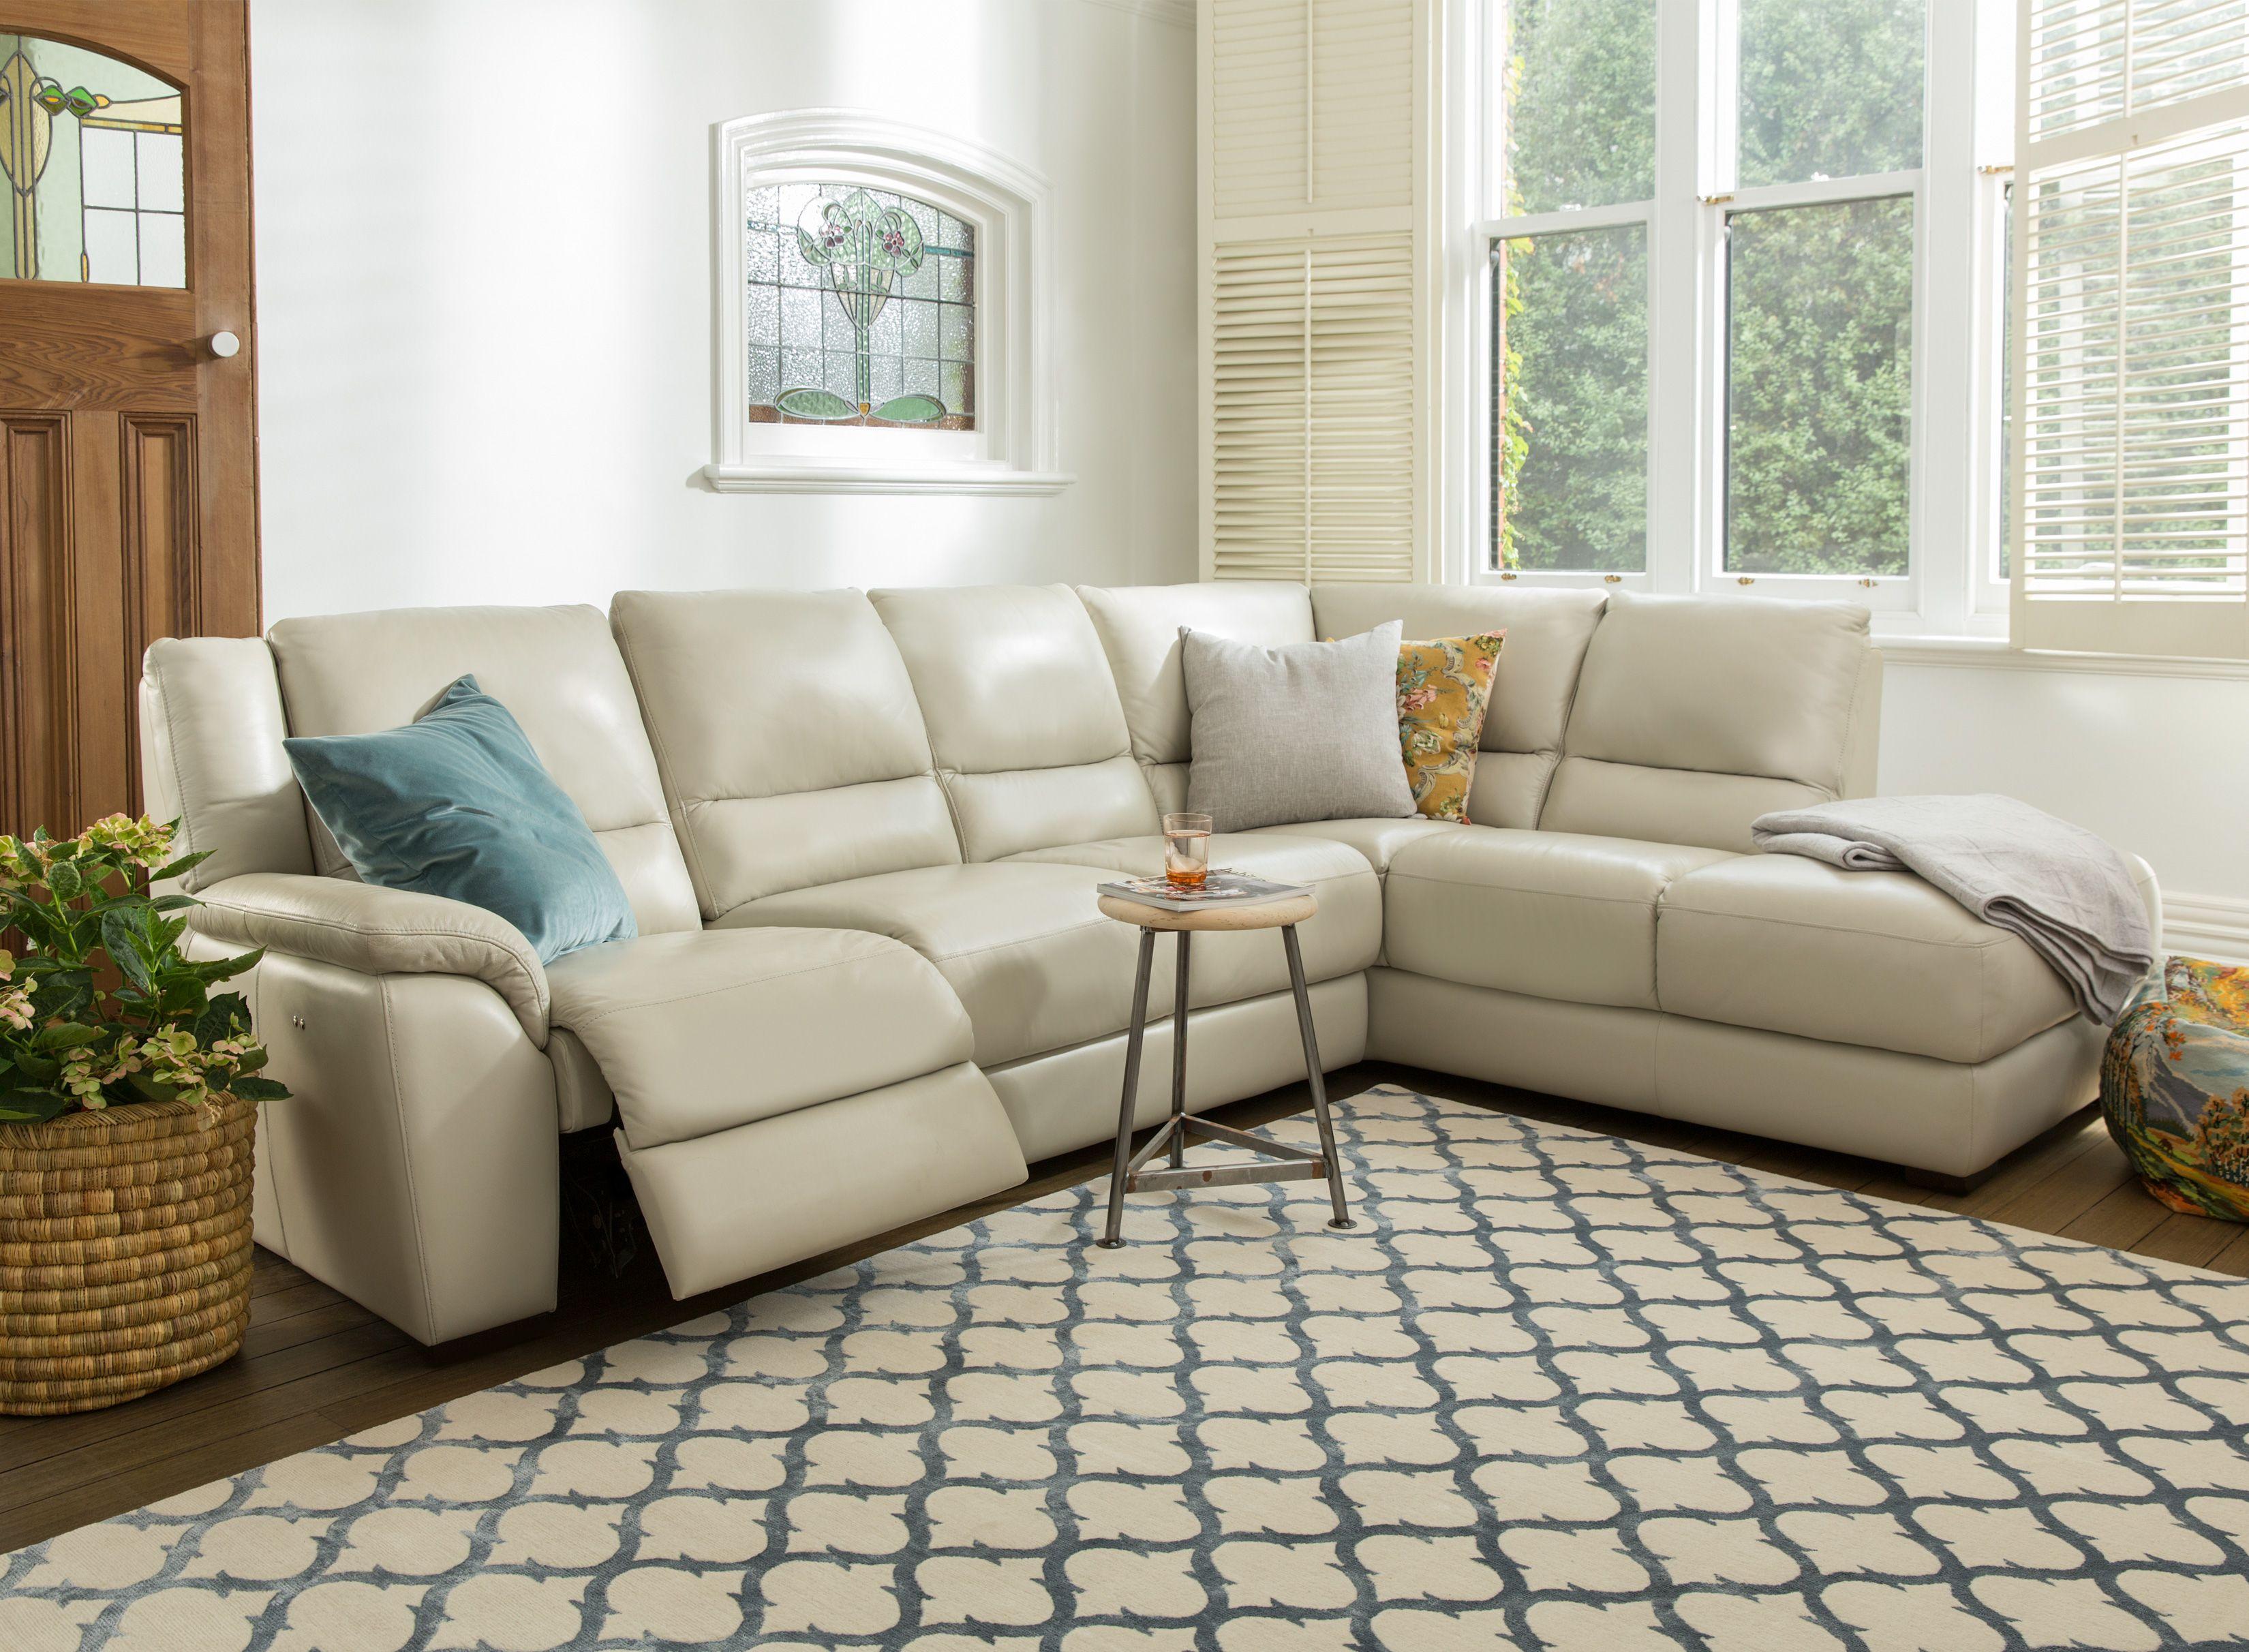 LEGATO Lounges Nick Scali Furniture Furniture